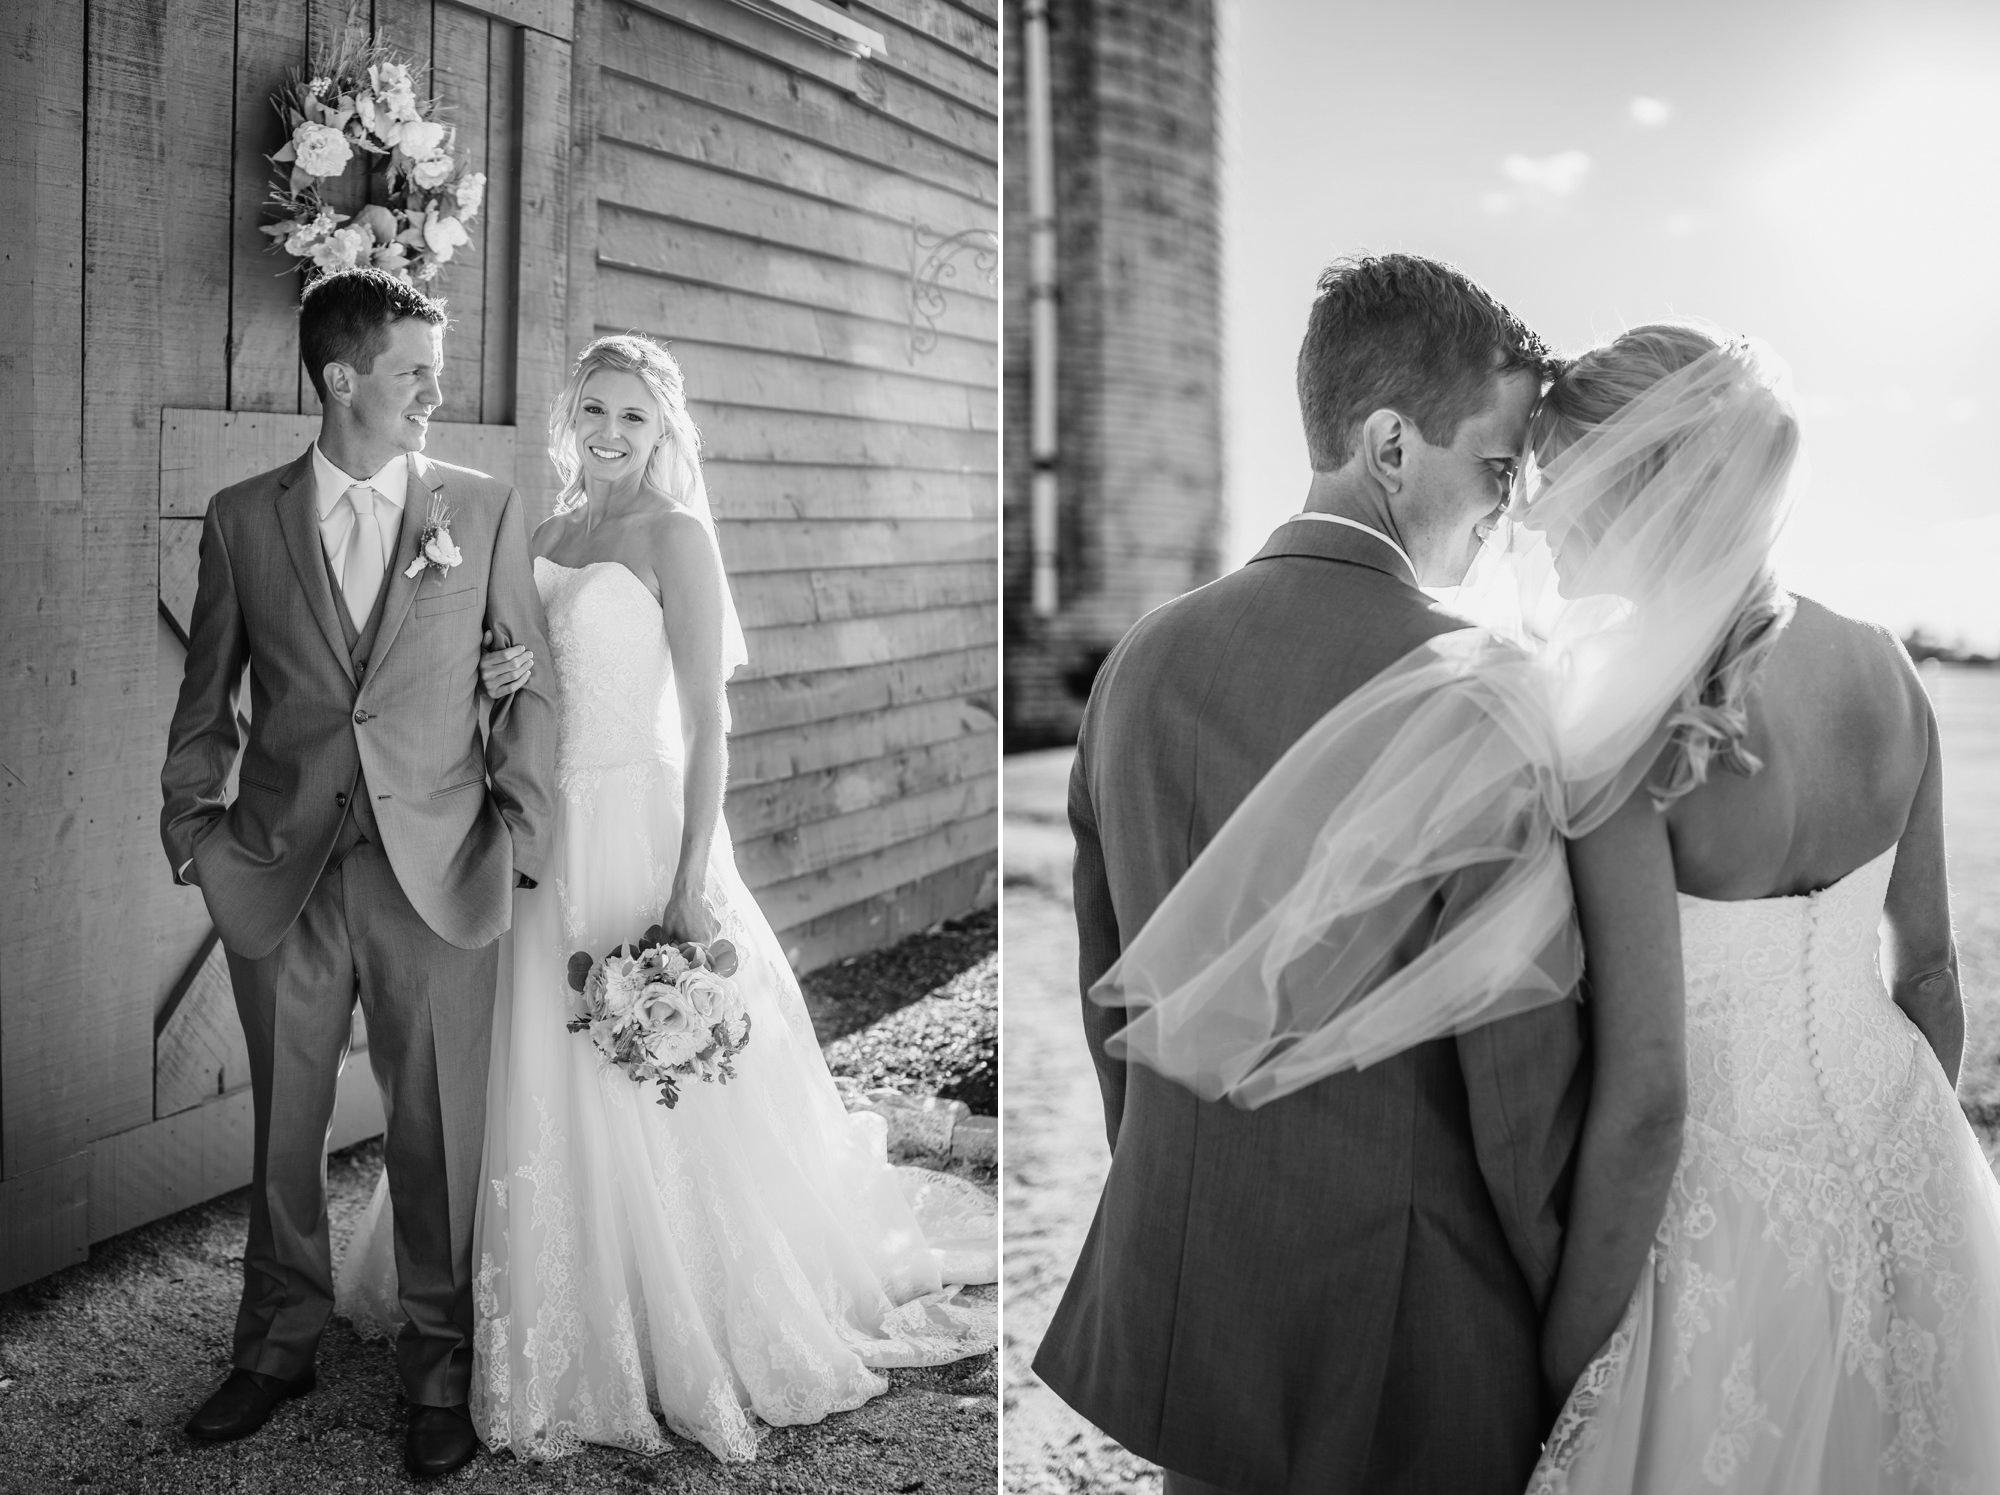 wedding-photography-virginia_0048.jpg